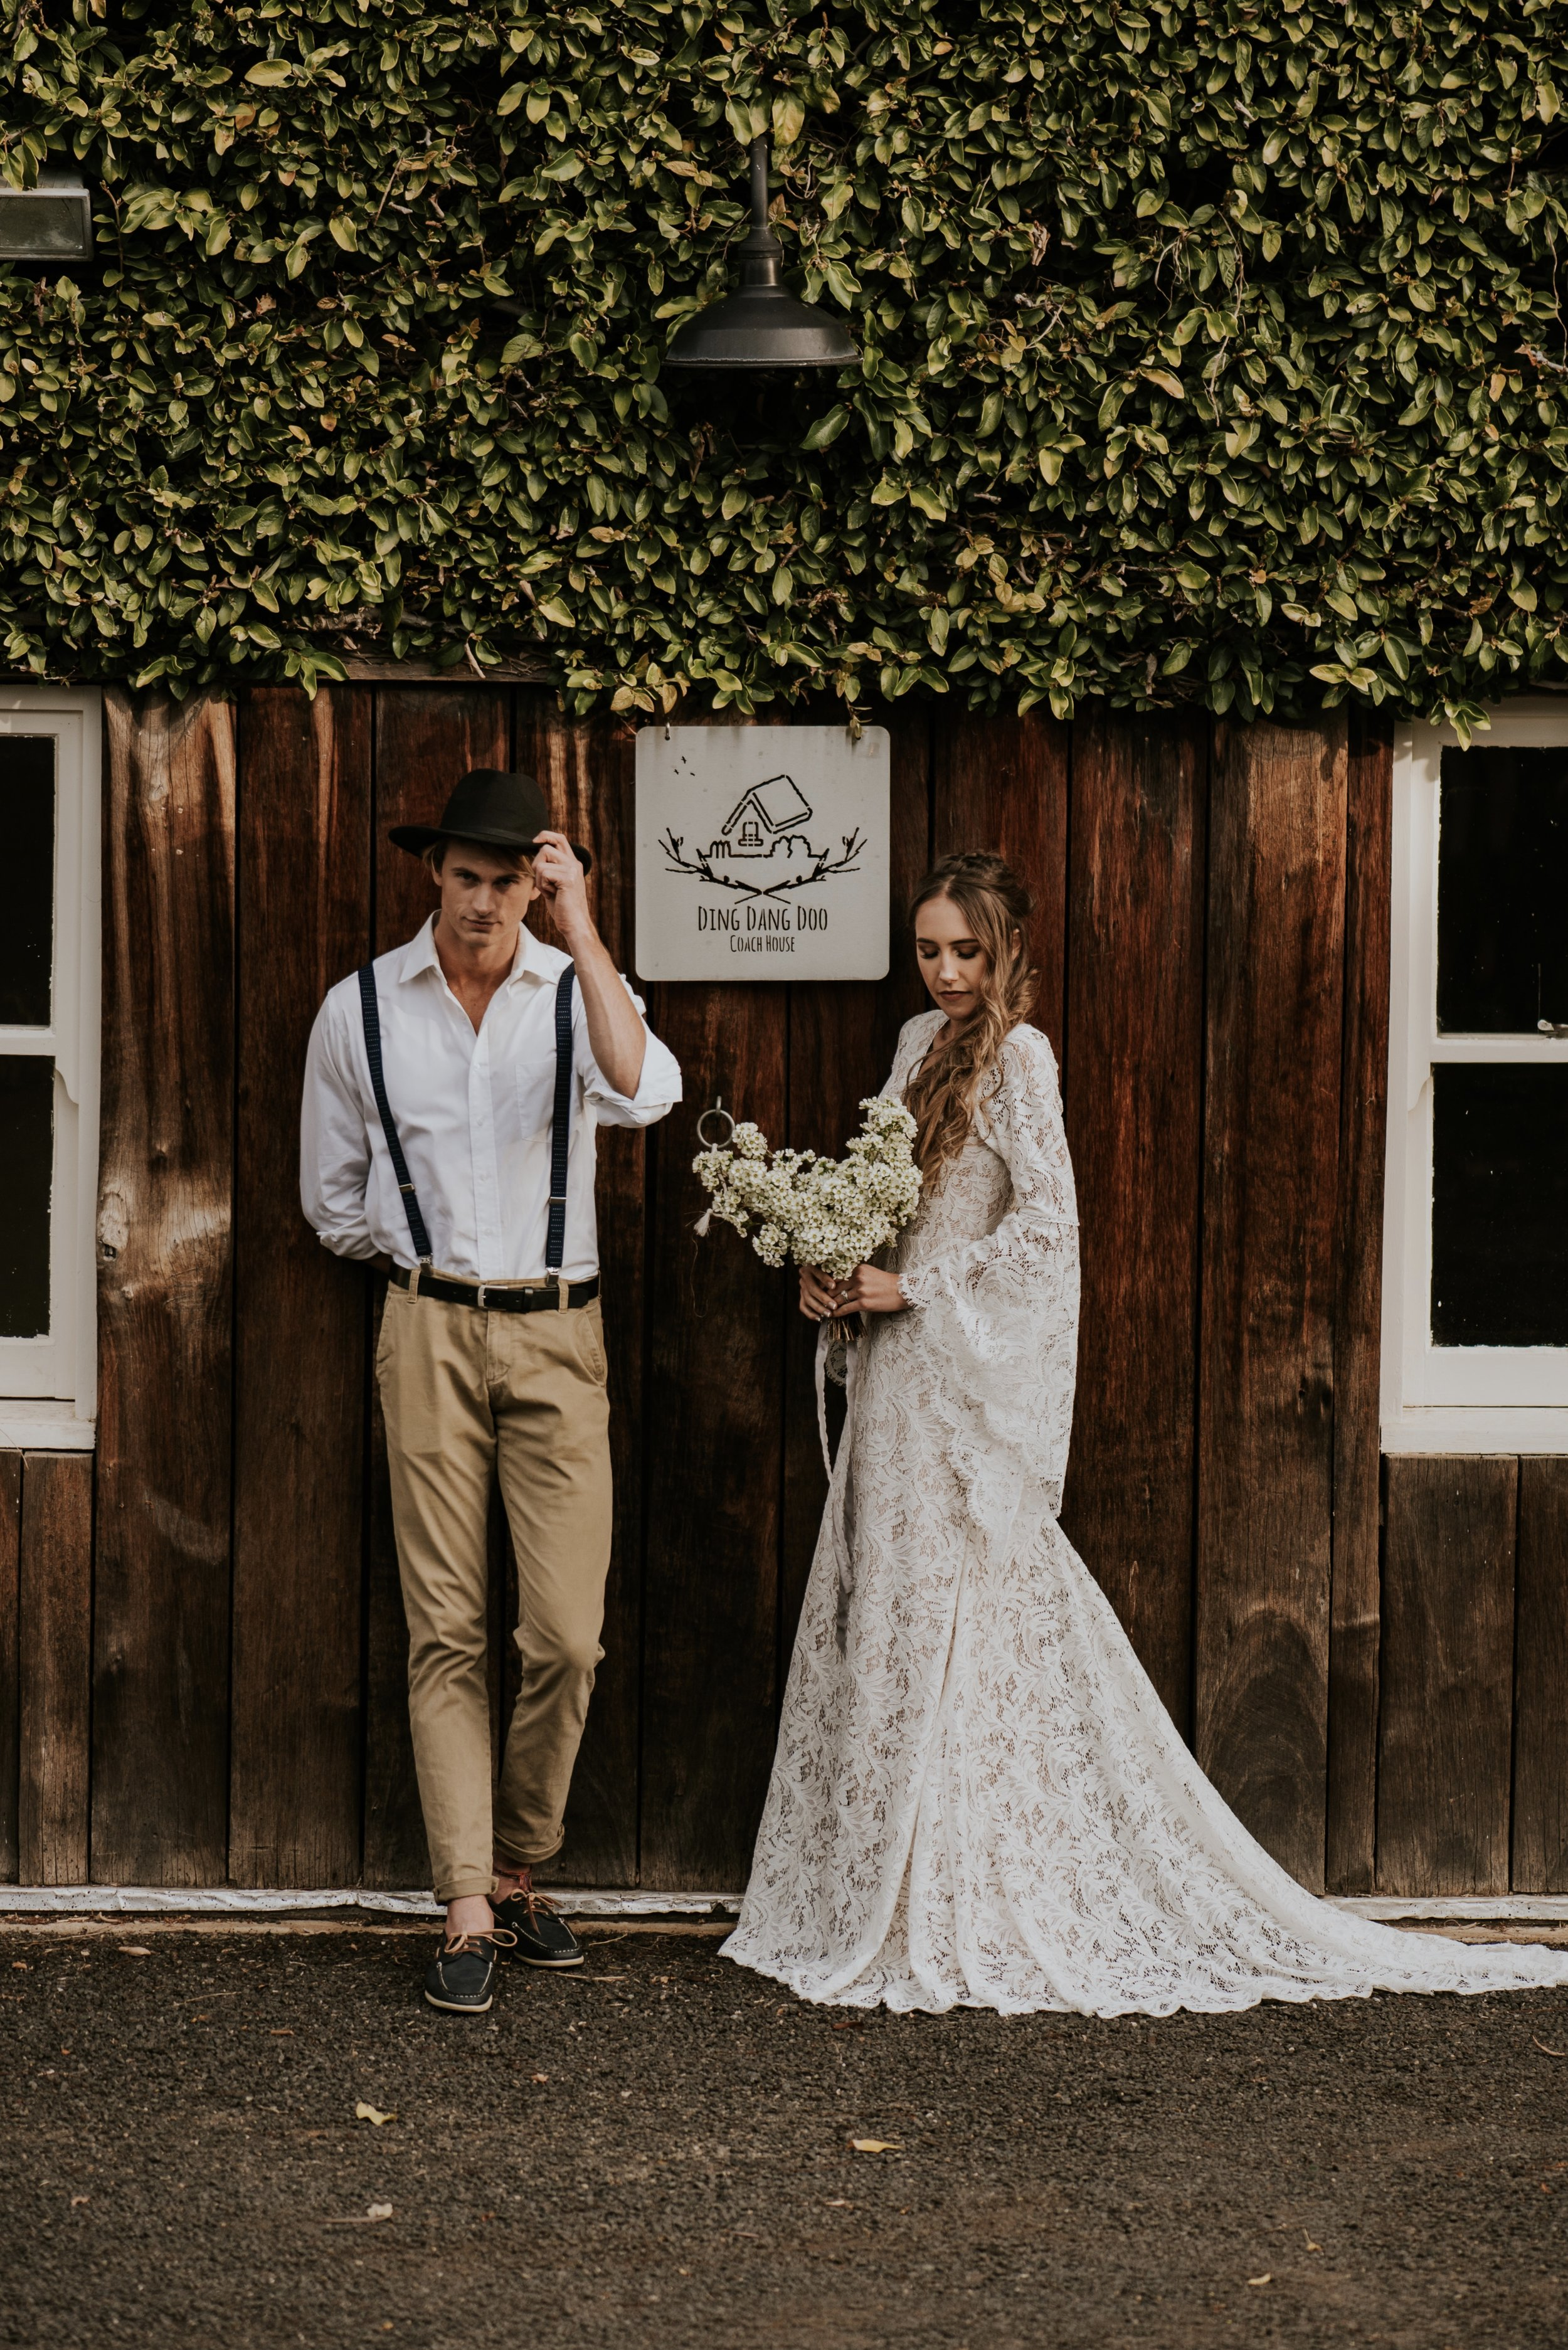 Ding Dang Doo Ranch - Blue Mountains Wedding    9th September 2018